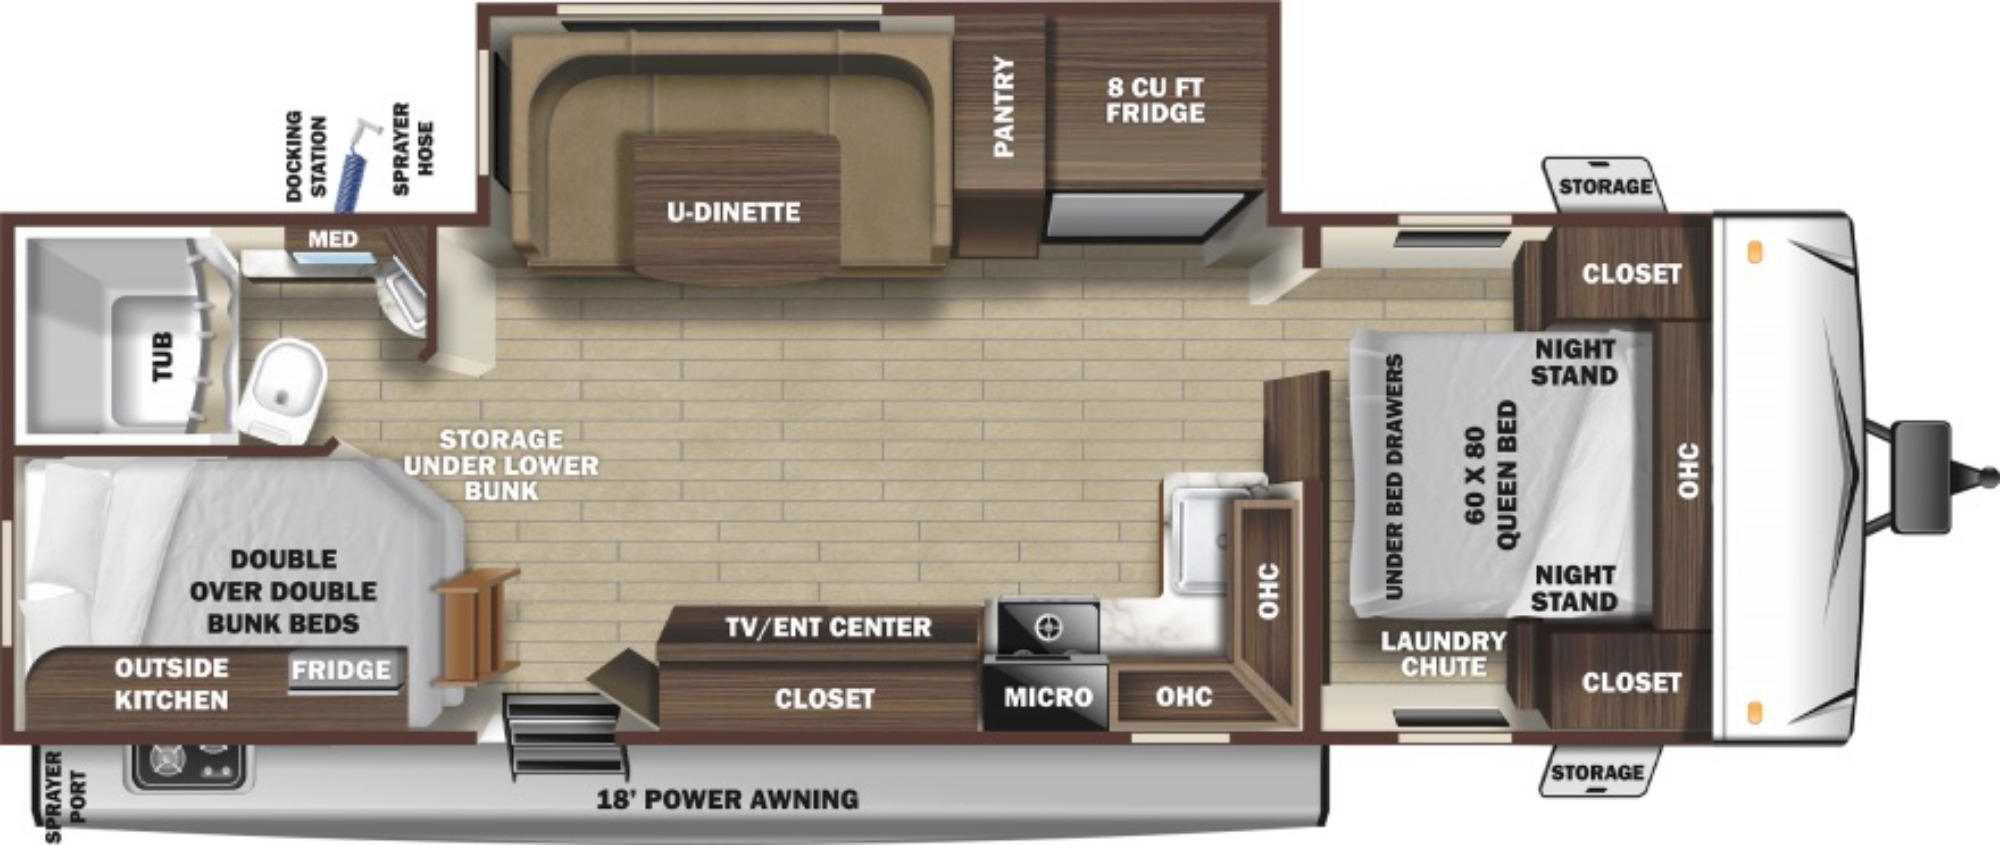 View Floor Plan for 2021 HIGHLAND RIDGE MESA RIDGE S-LITE 241BH